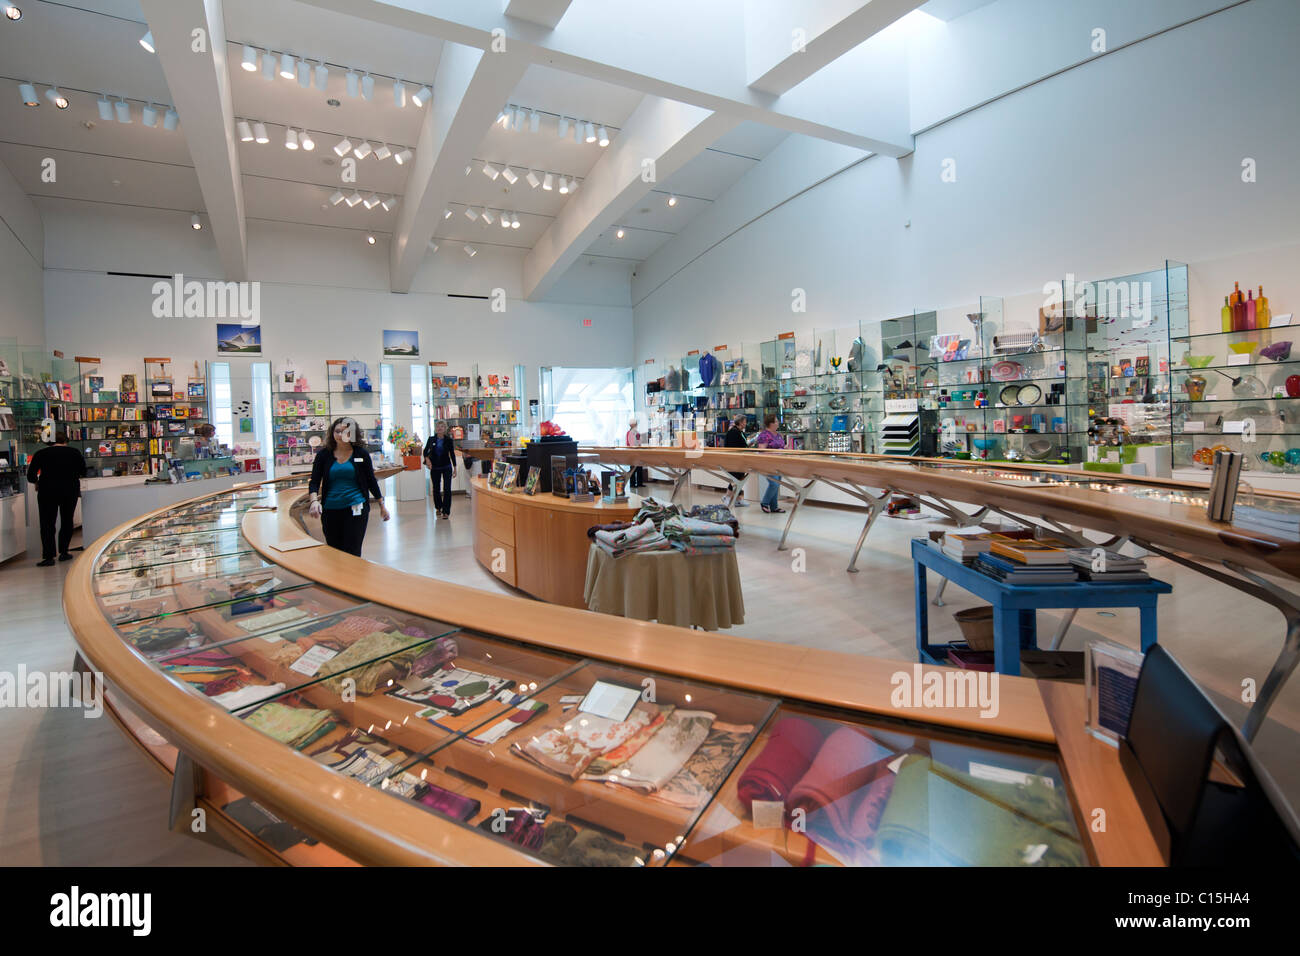 aabfee2a5f0bbf Museum Store, Quadracci Pavilion, designed by Santiago Calatrava, Milwaukee  Art Museum, Wisconsin